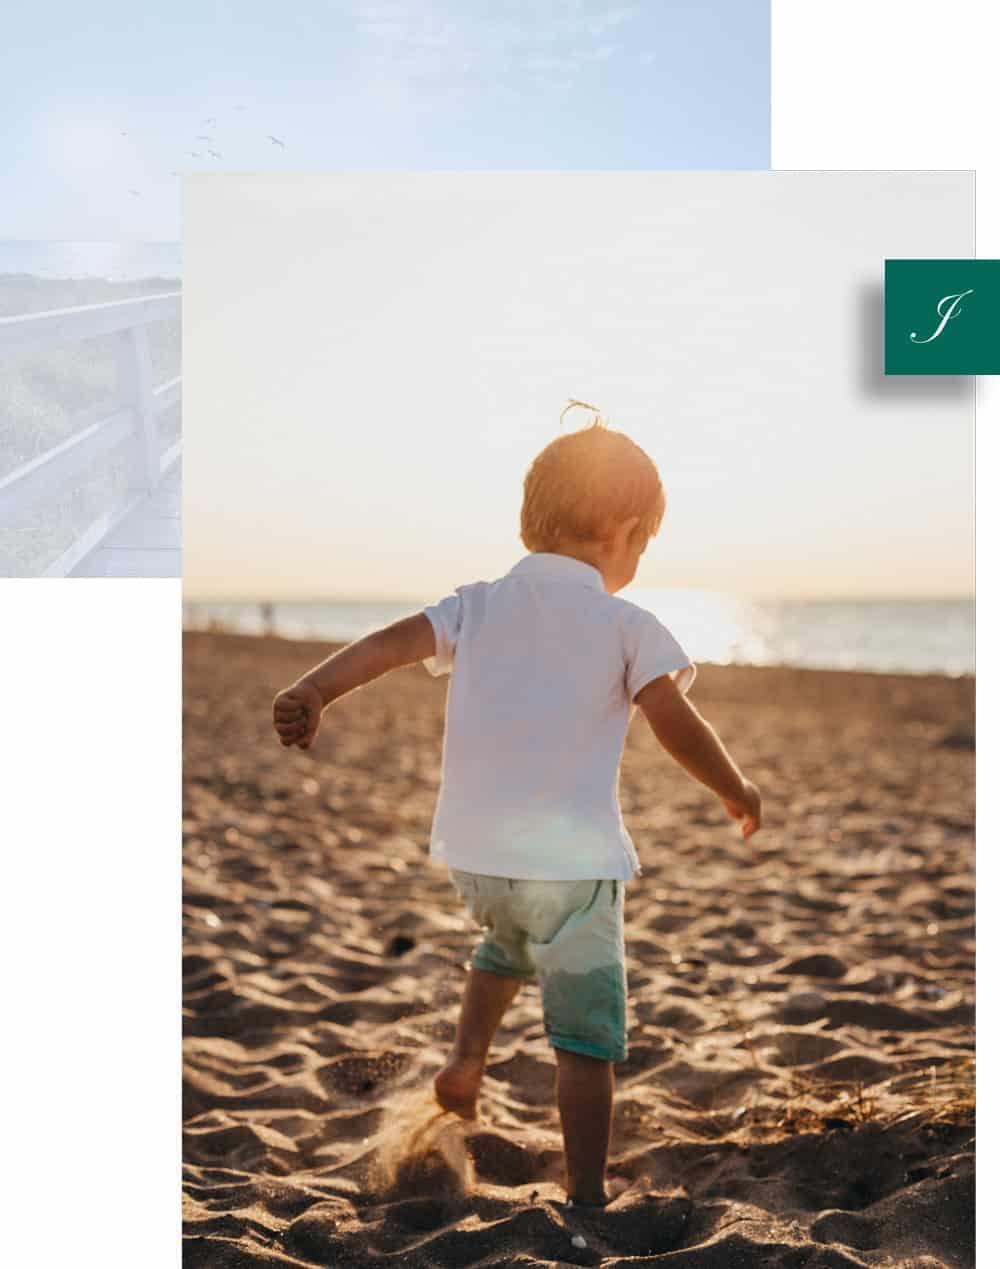 baby walking on sandy beach in the sunshine